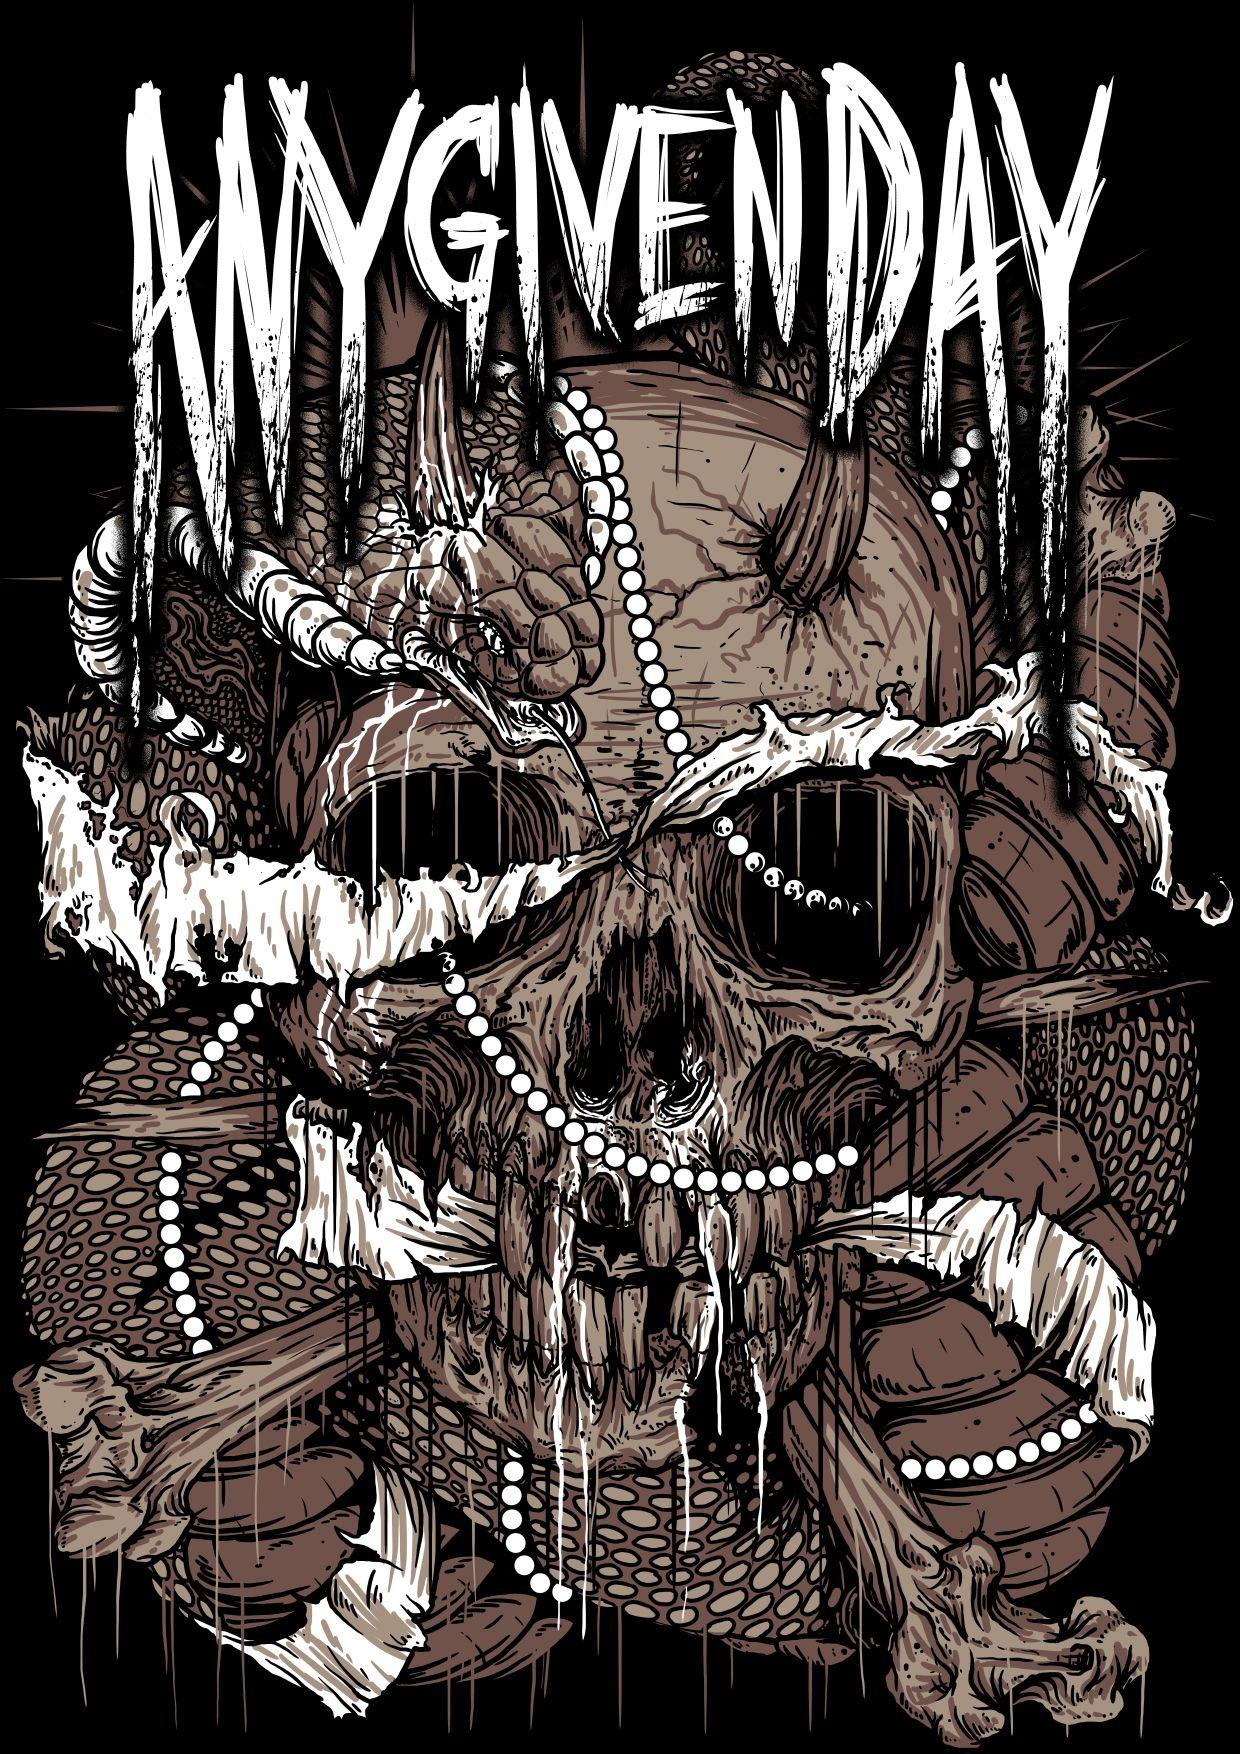 Agd anygivenday metal metalcore deathcore metalhead graveart ga